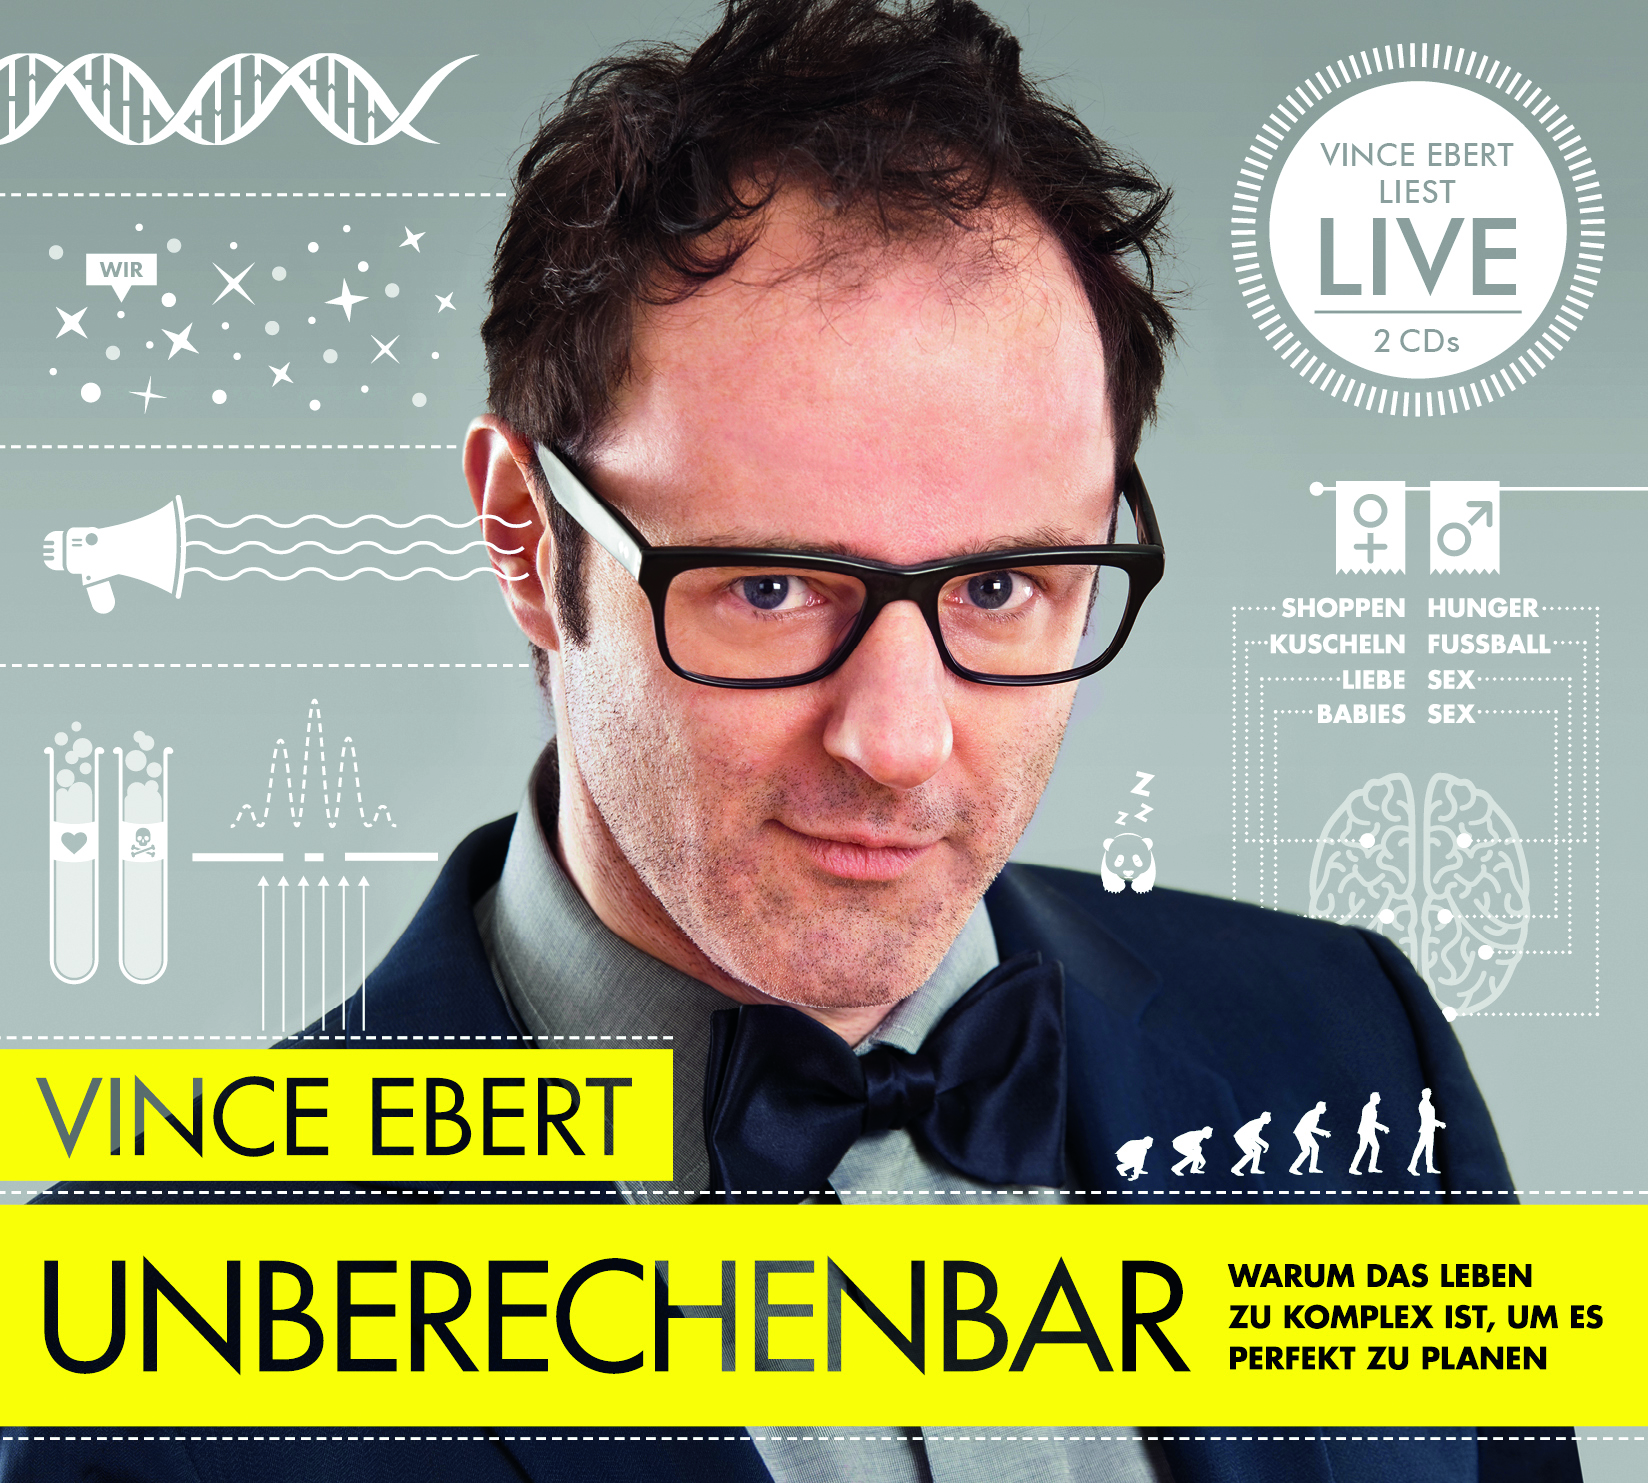 Expert Marketplace -  Vince Ebert  - Hörbuch - Unberechenbar: Warum das Leben zu komplex ist, um es perfekt zu planen